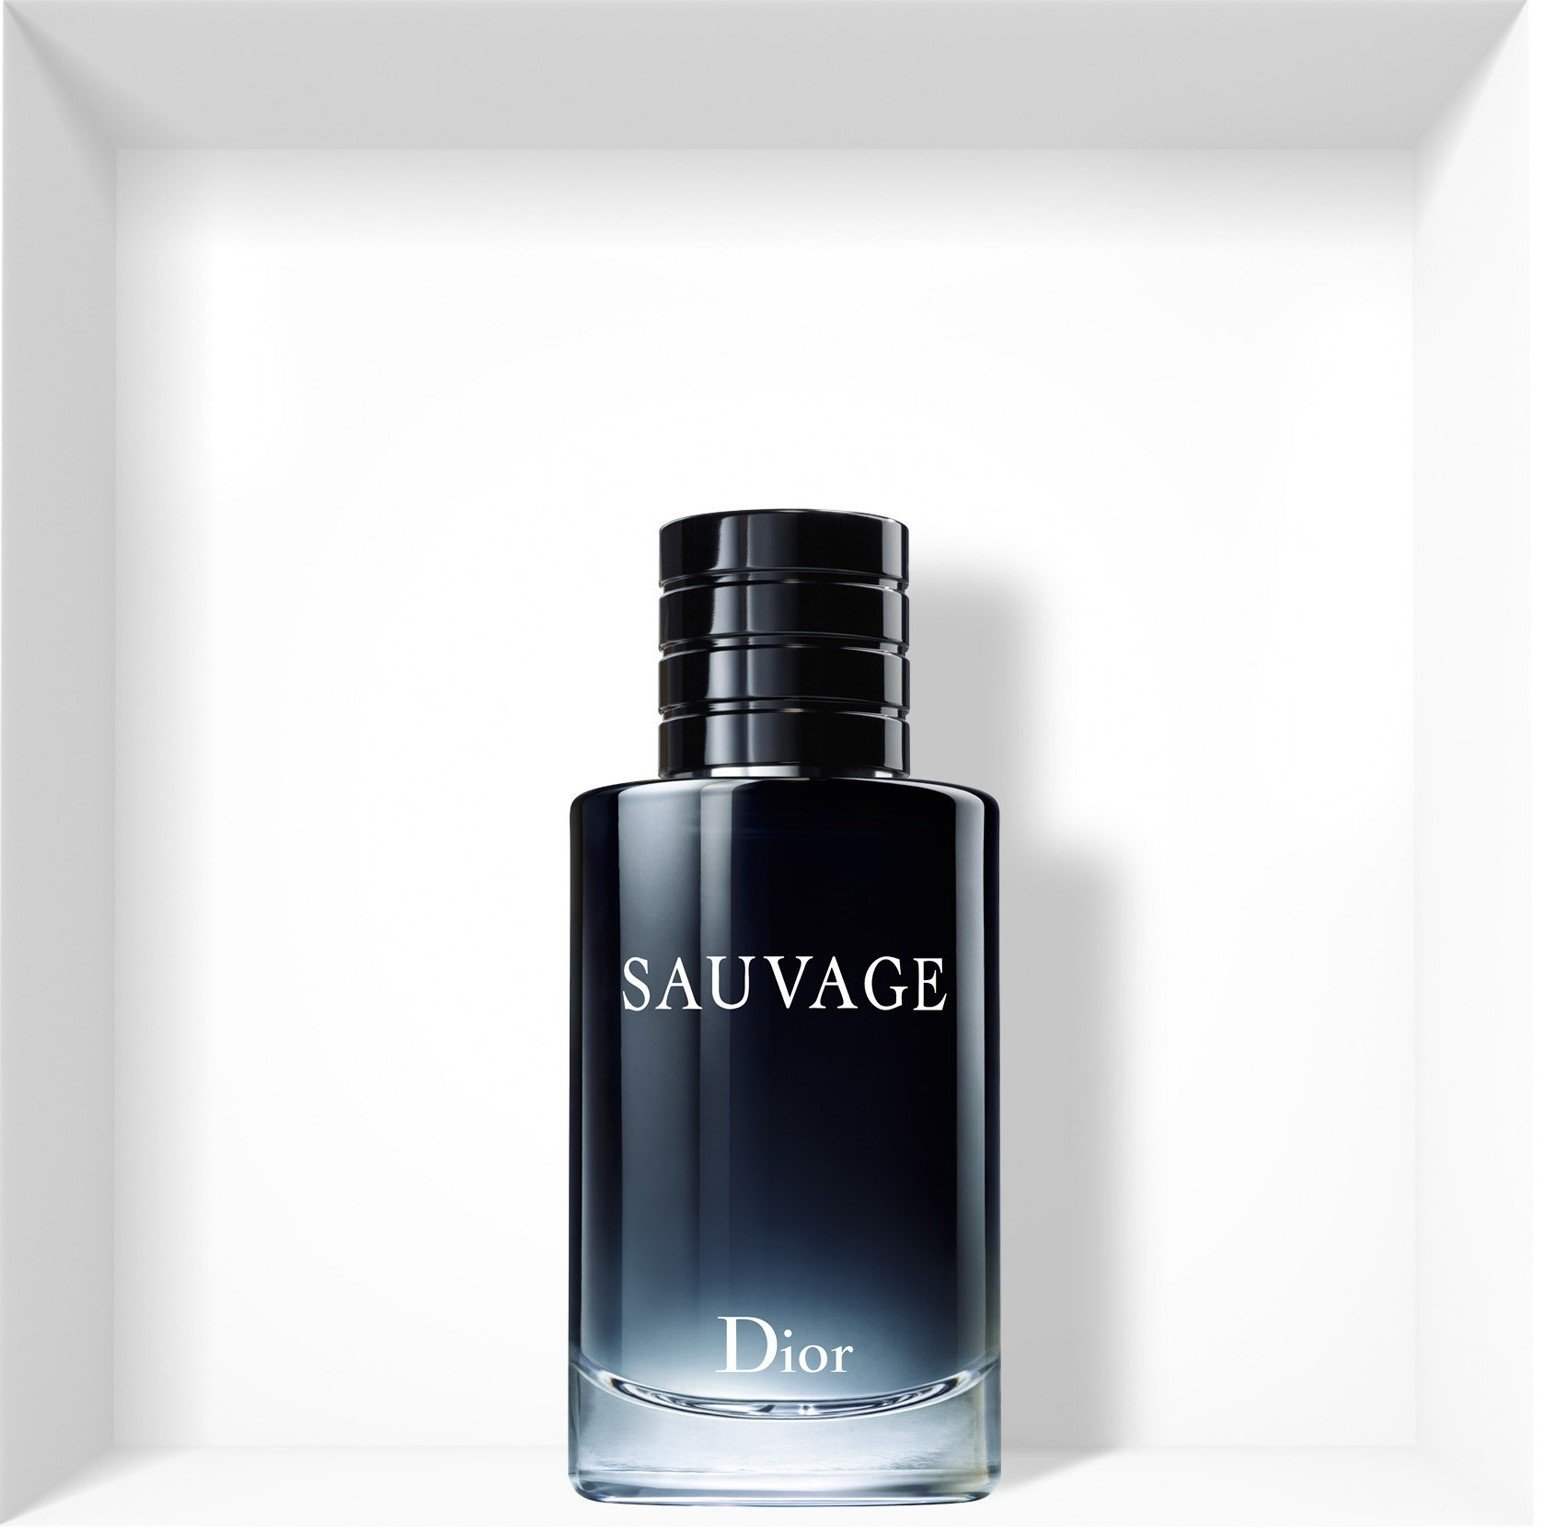 Christian Dior Sauvage for Men Eau De Toilette Spray, 3.4 Fluid Ounce